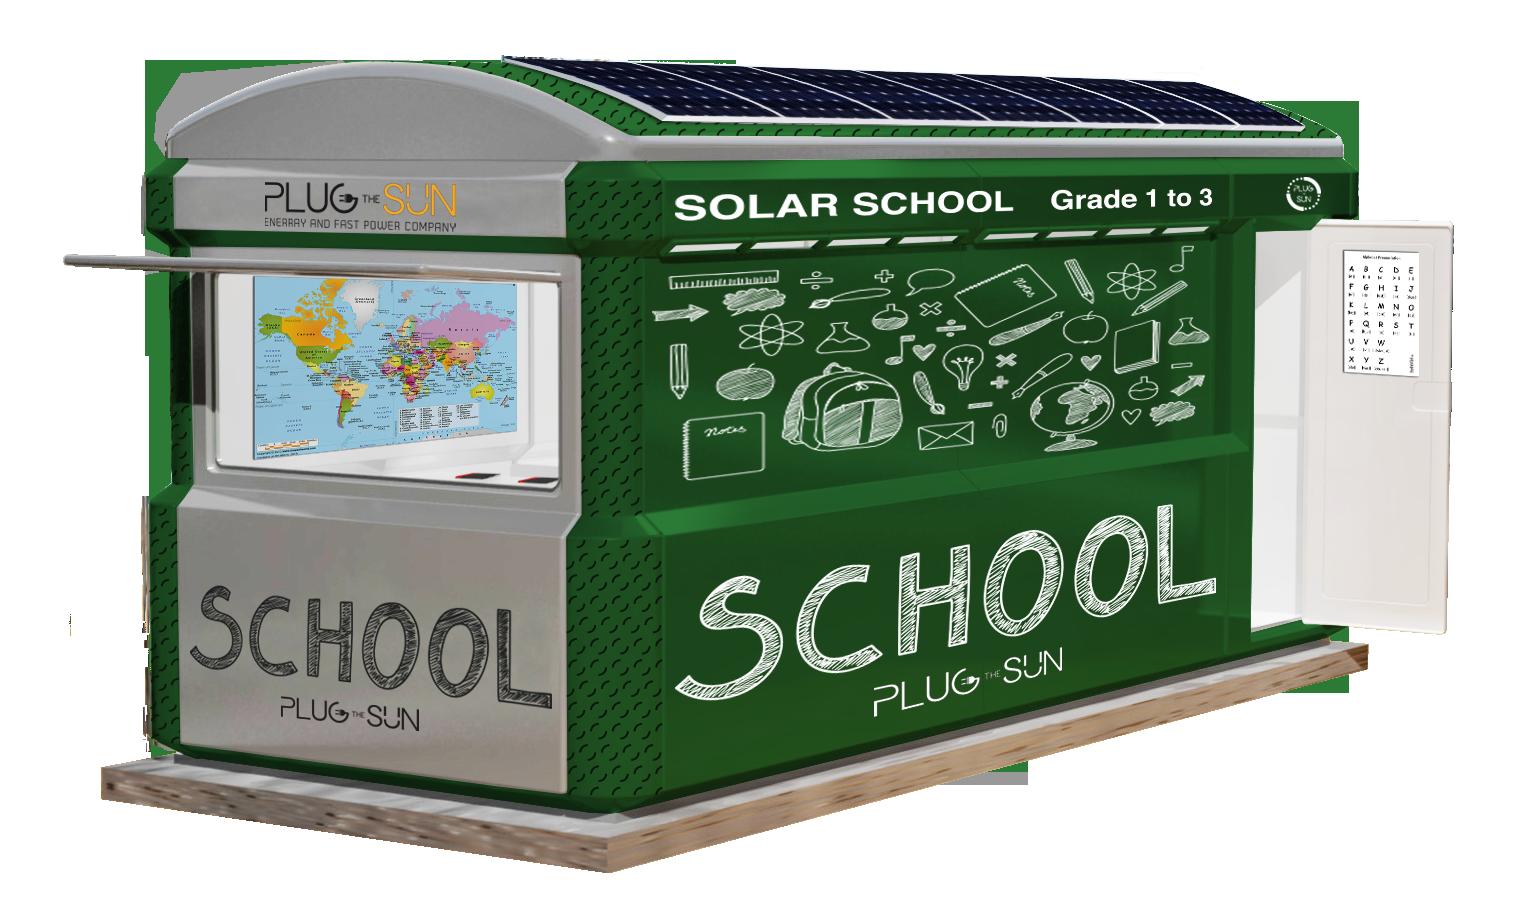 rayvill mobile solar-powered school point external